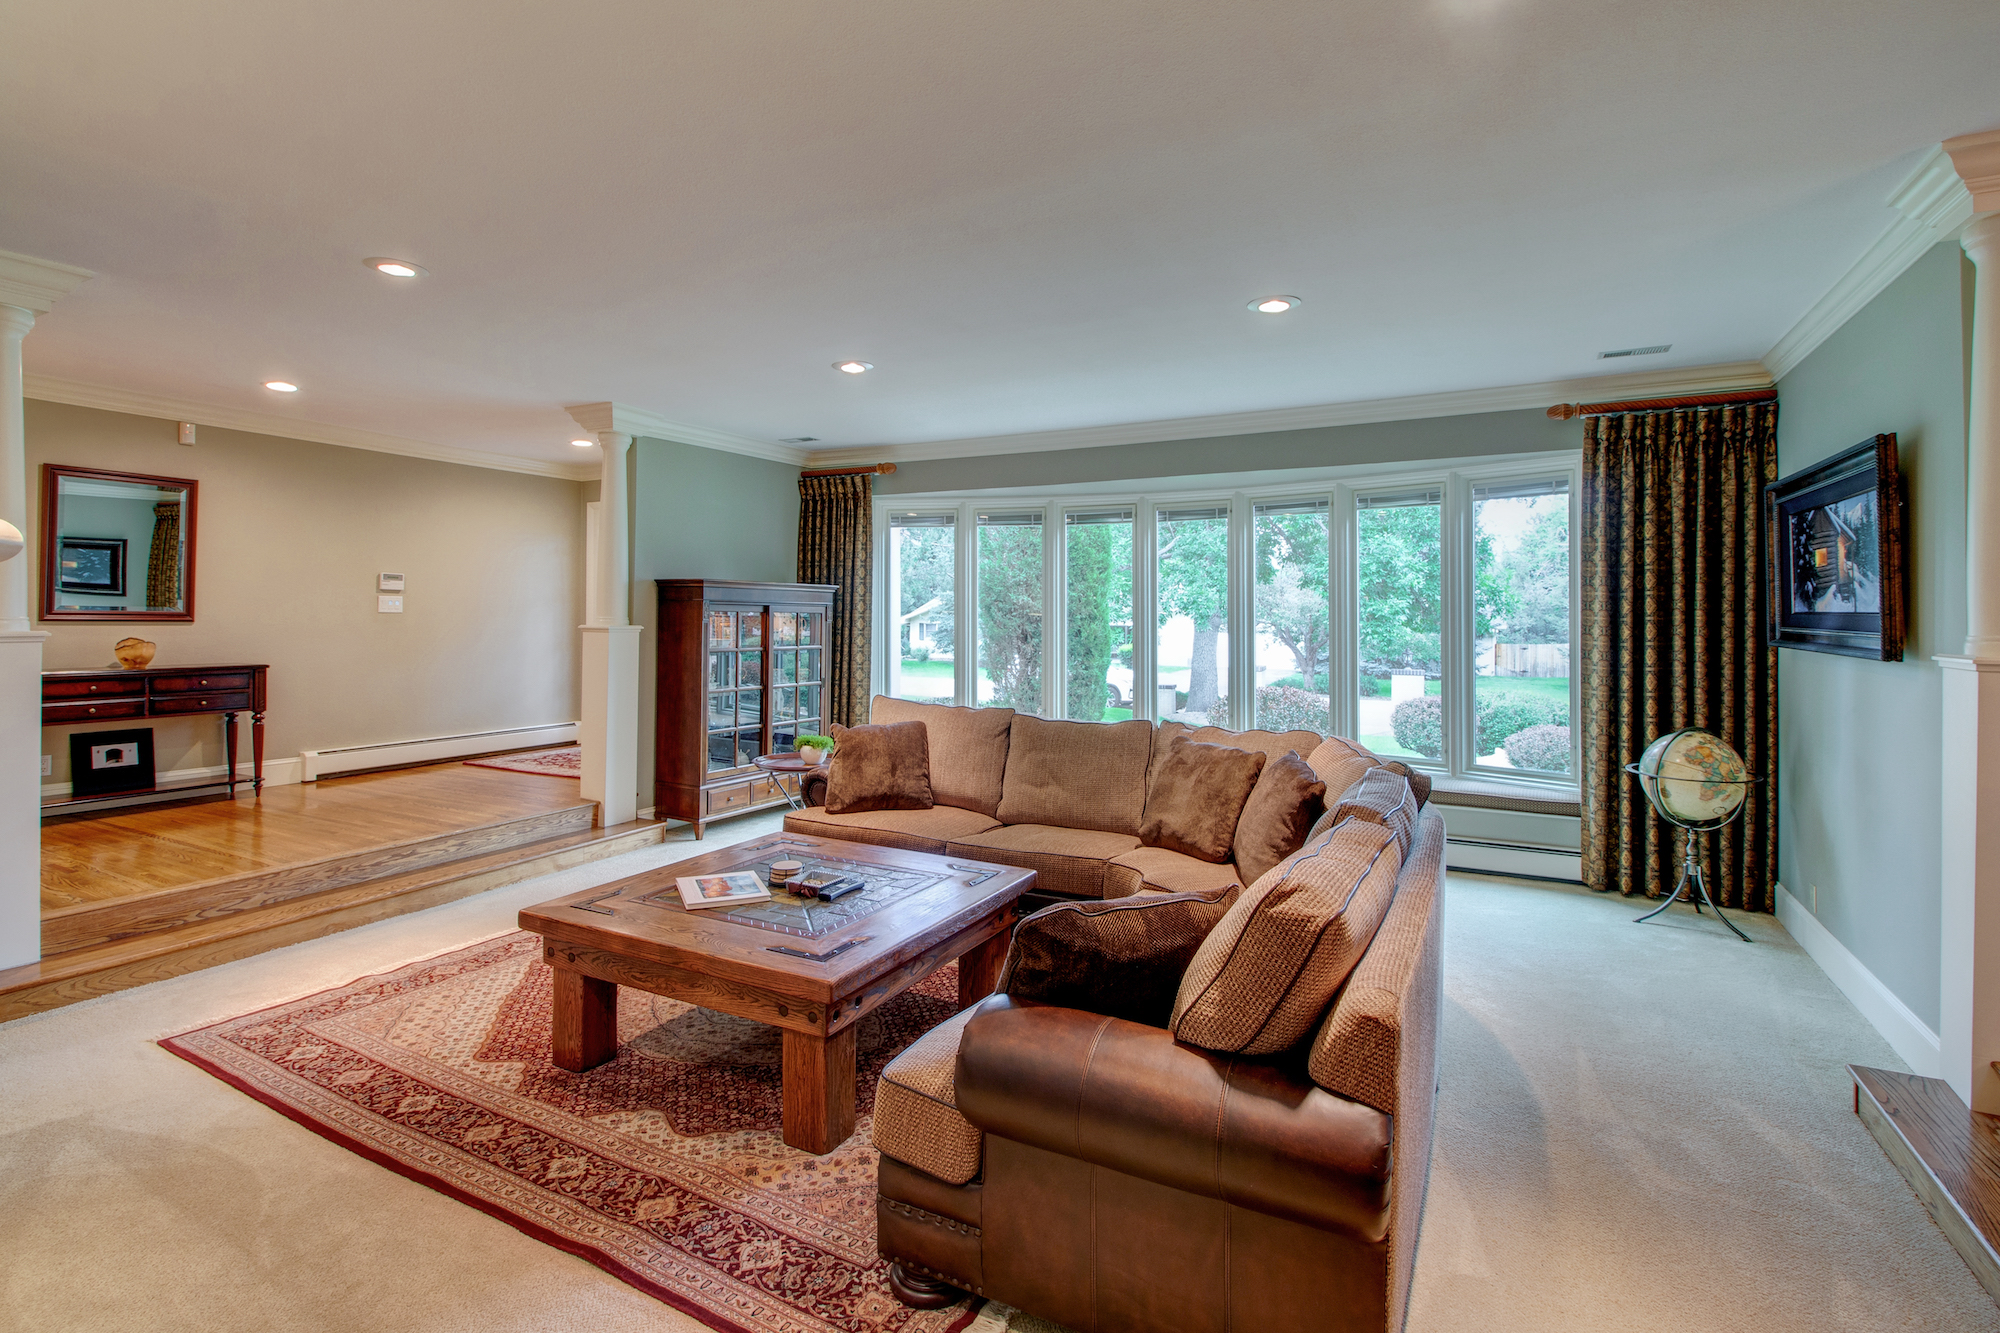 2-Living room has lovely bay window w seating bench.jpg